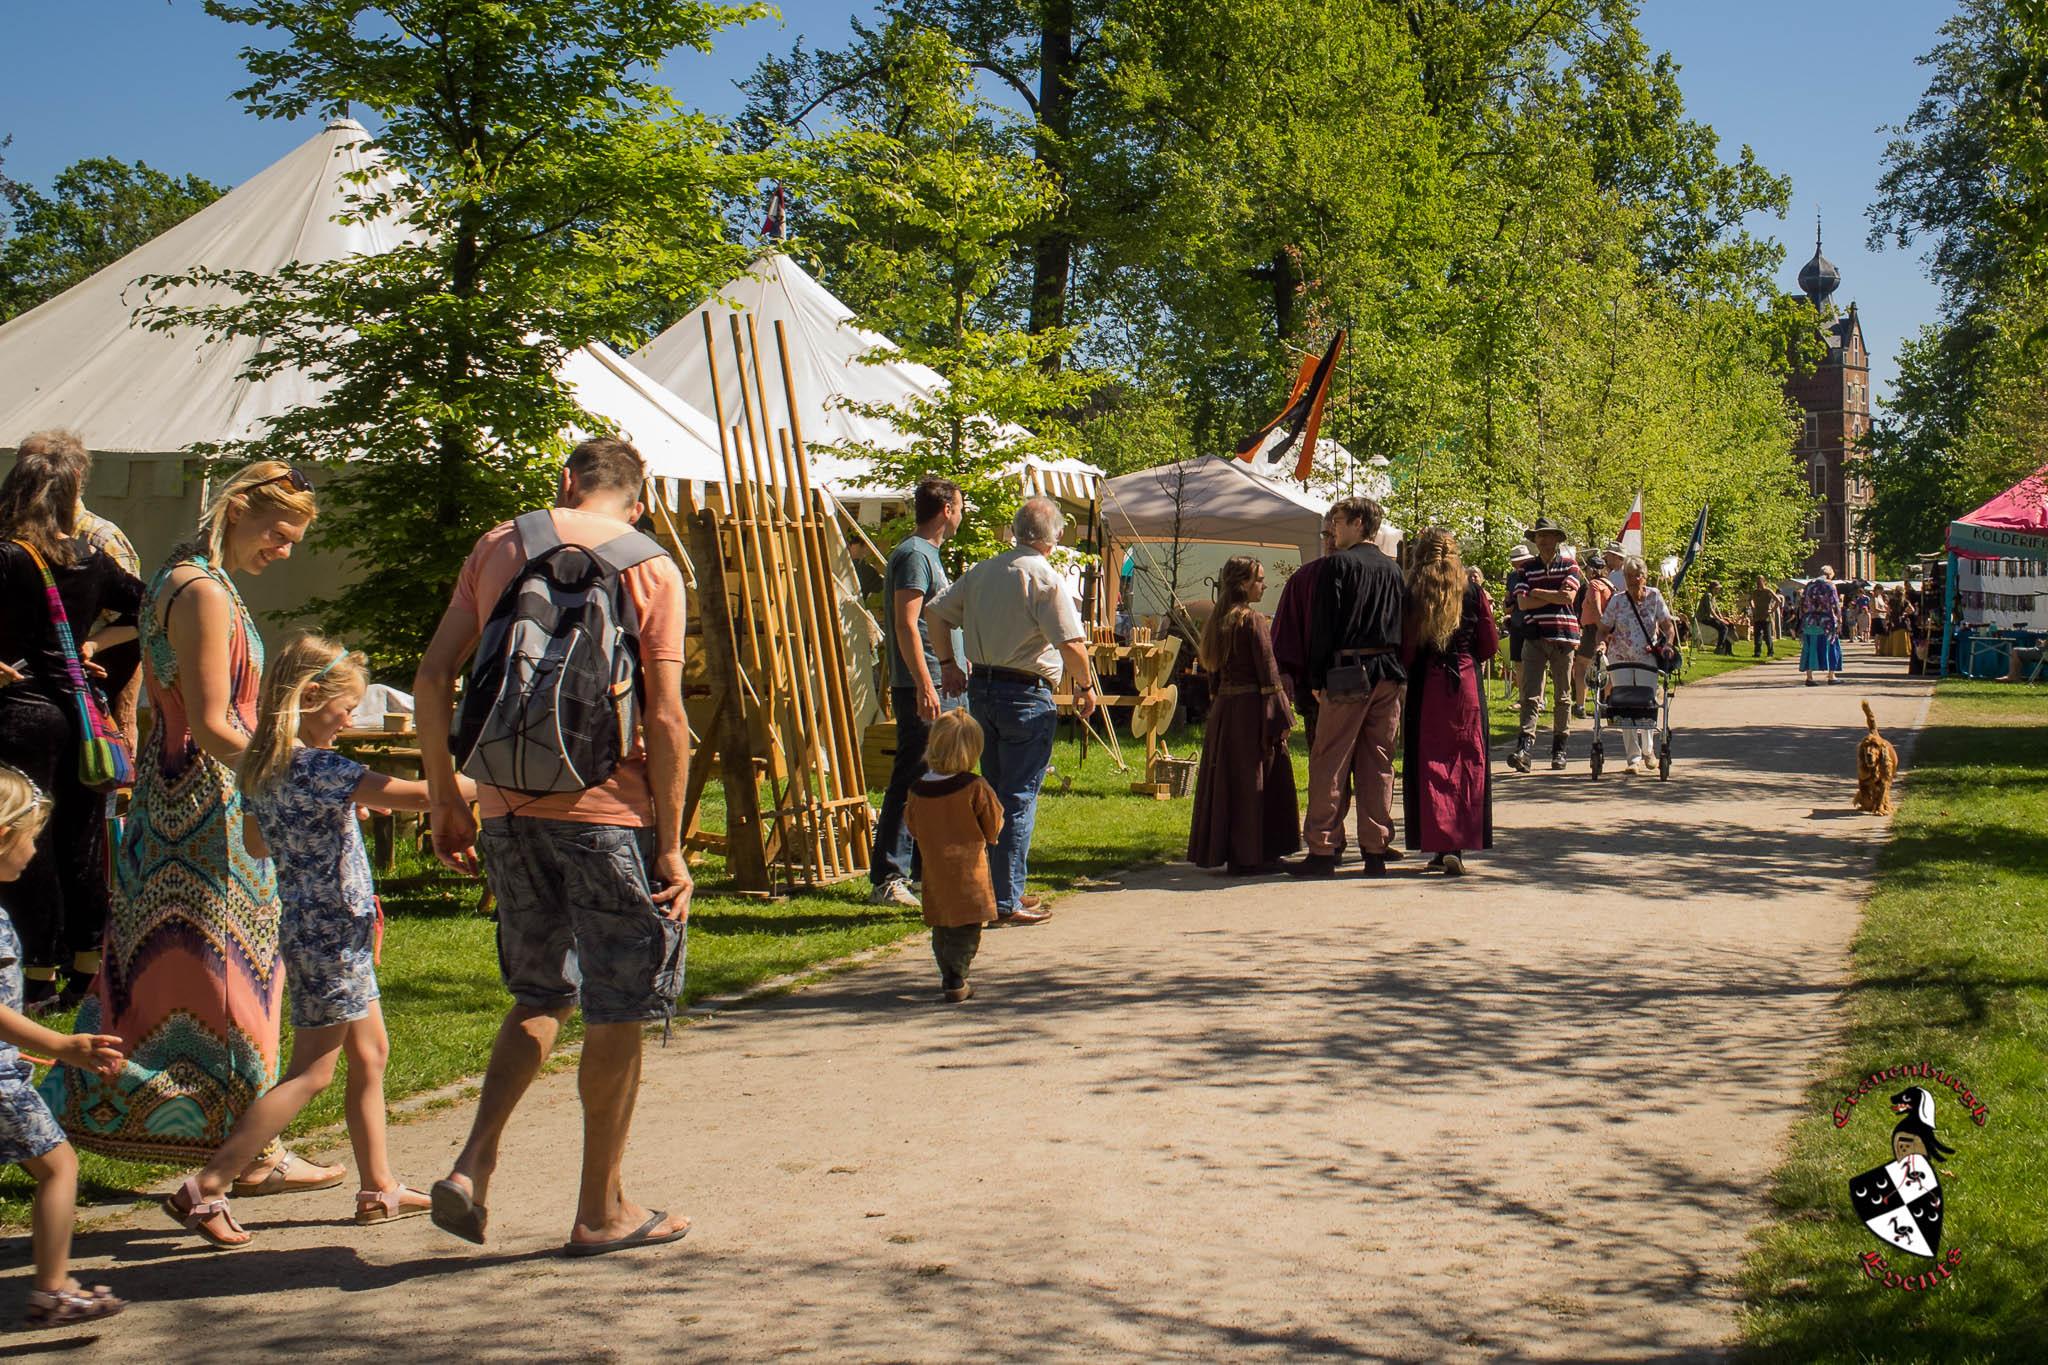 Middeleeuws-Festijn-Cannenburgh-2018-Algemeen-Ellen-la-Faille-18